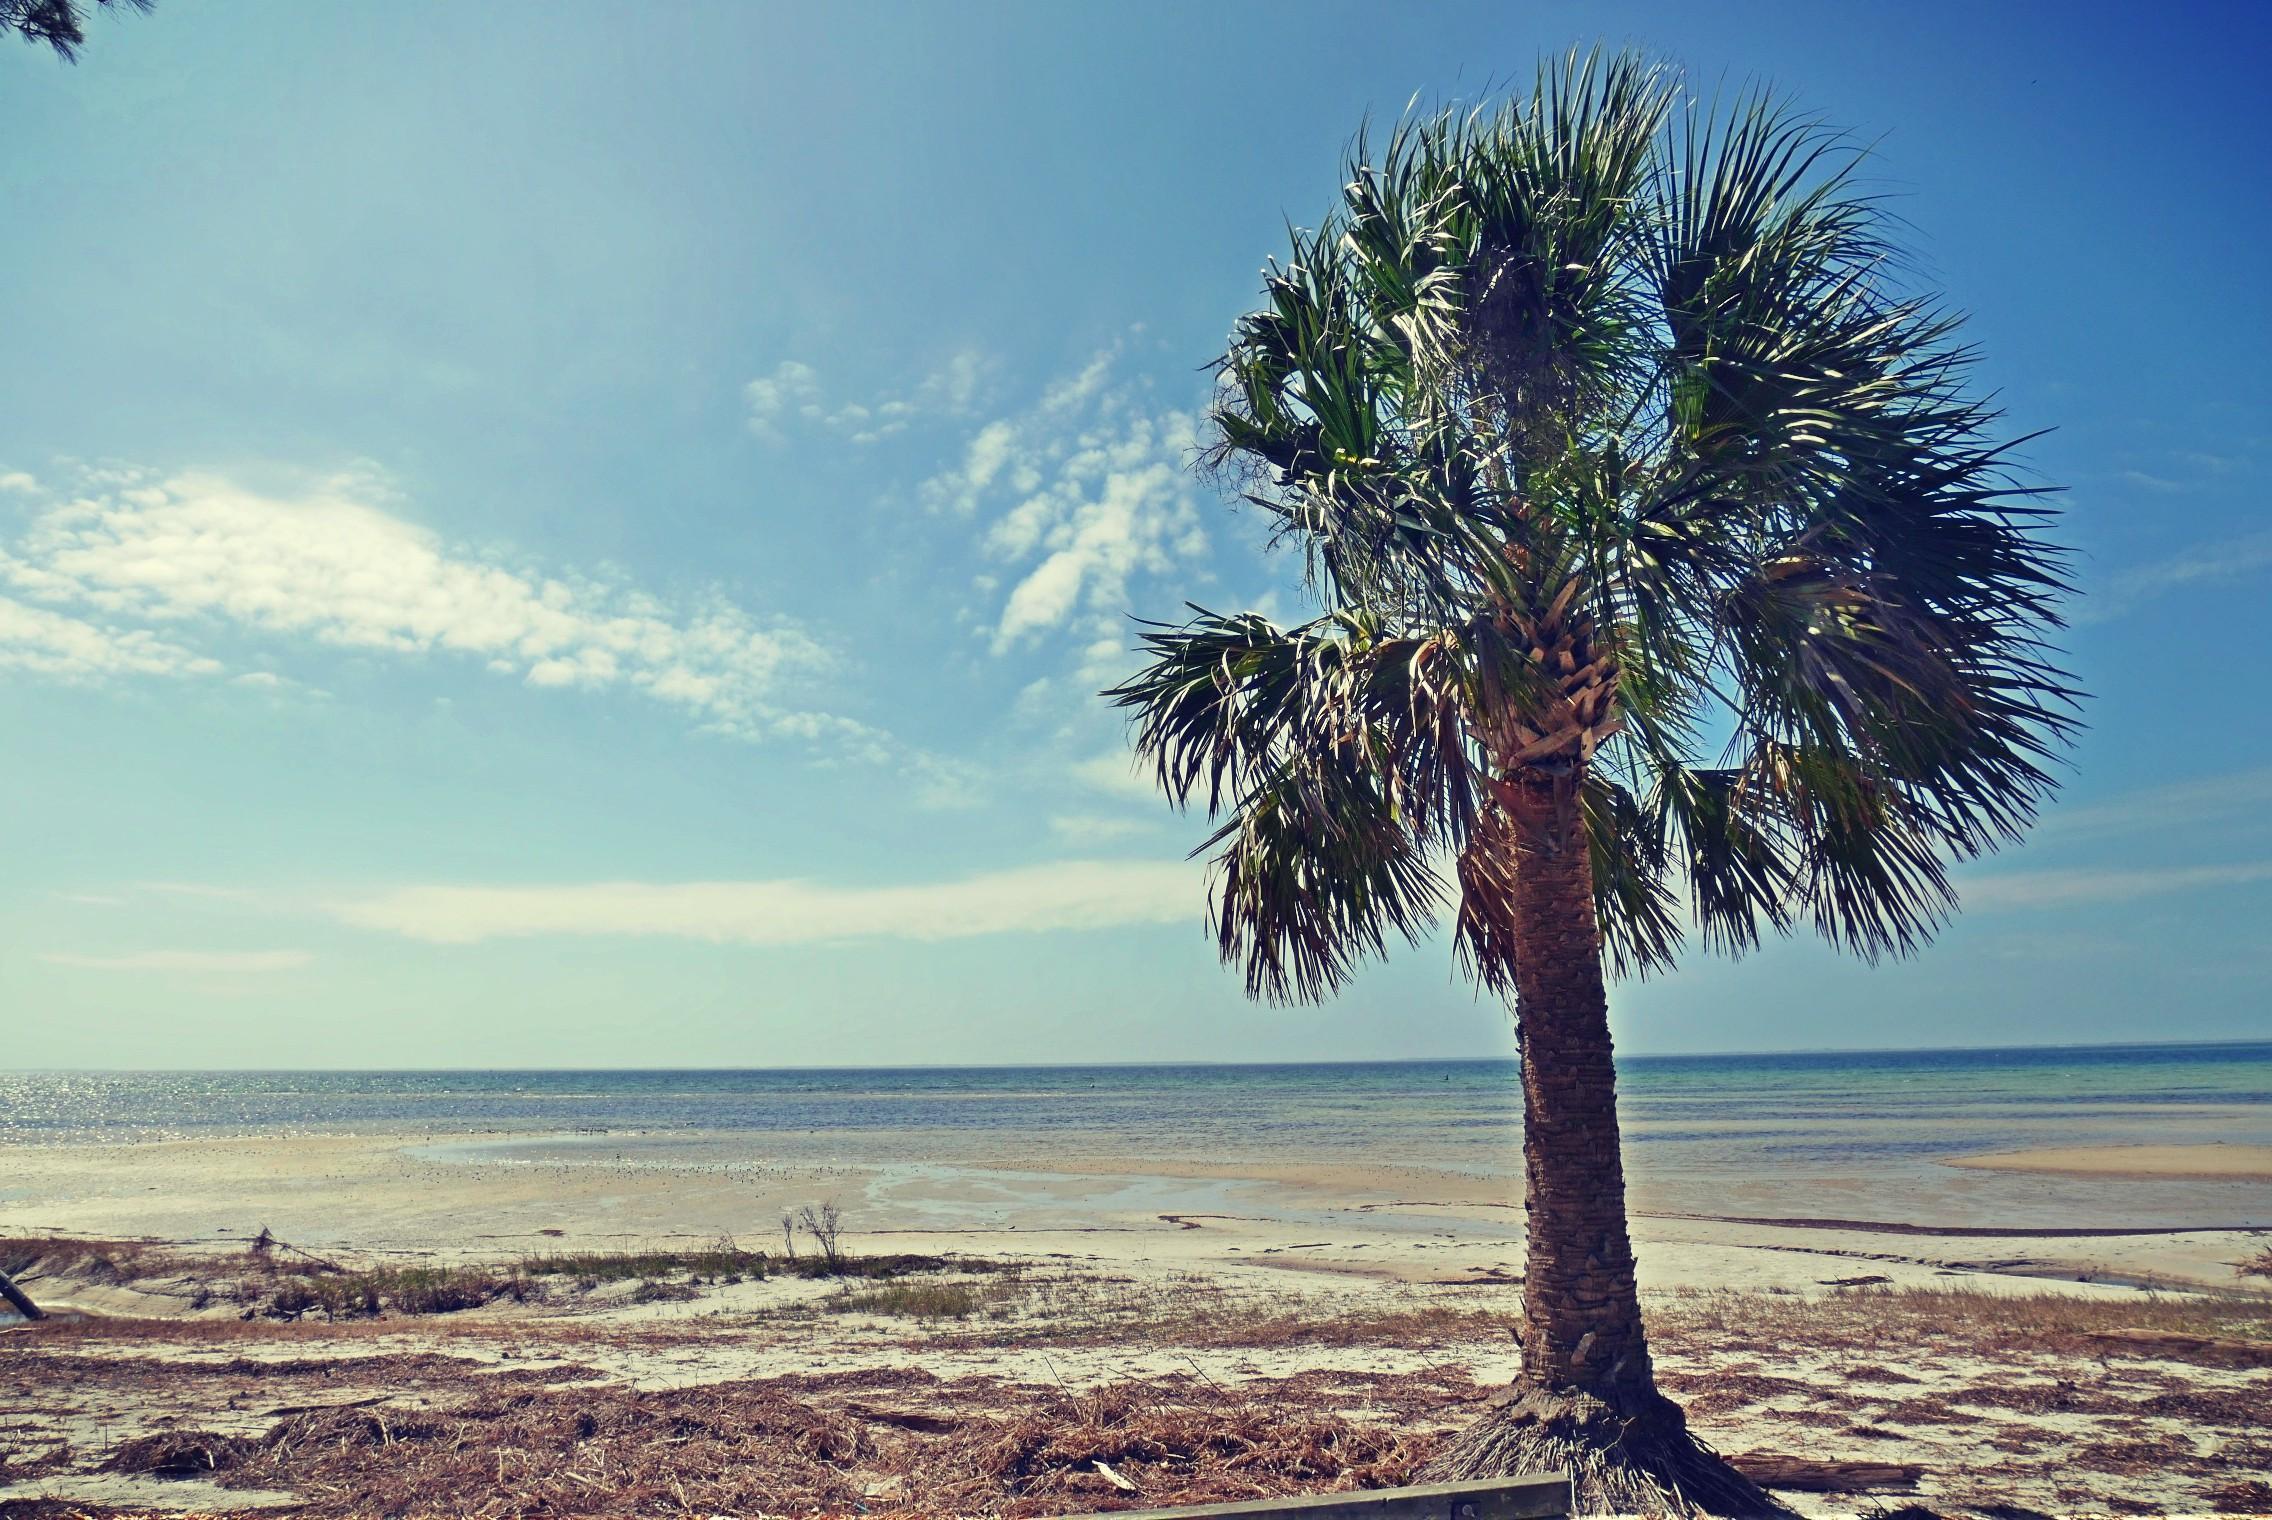 St. Joseph Bay - Port St. Joe, FL